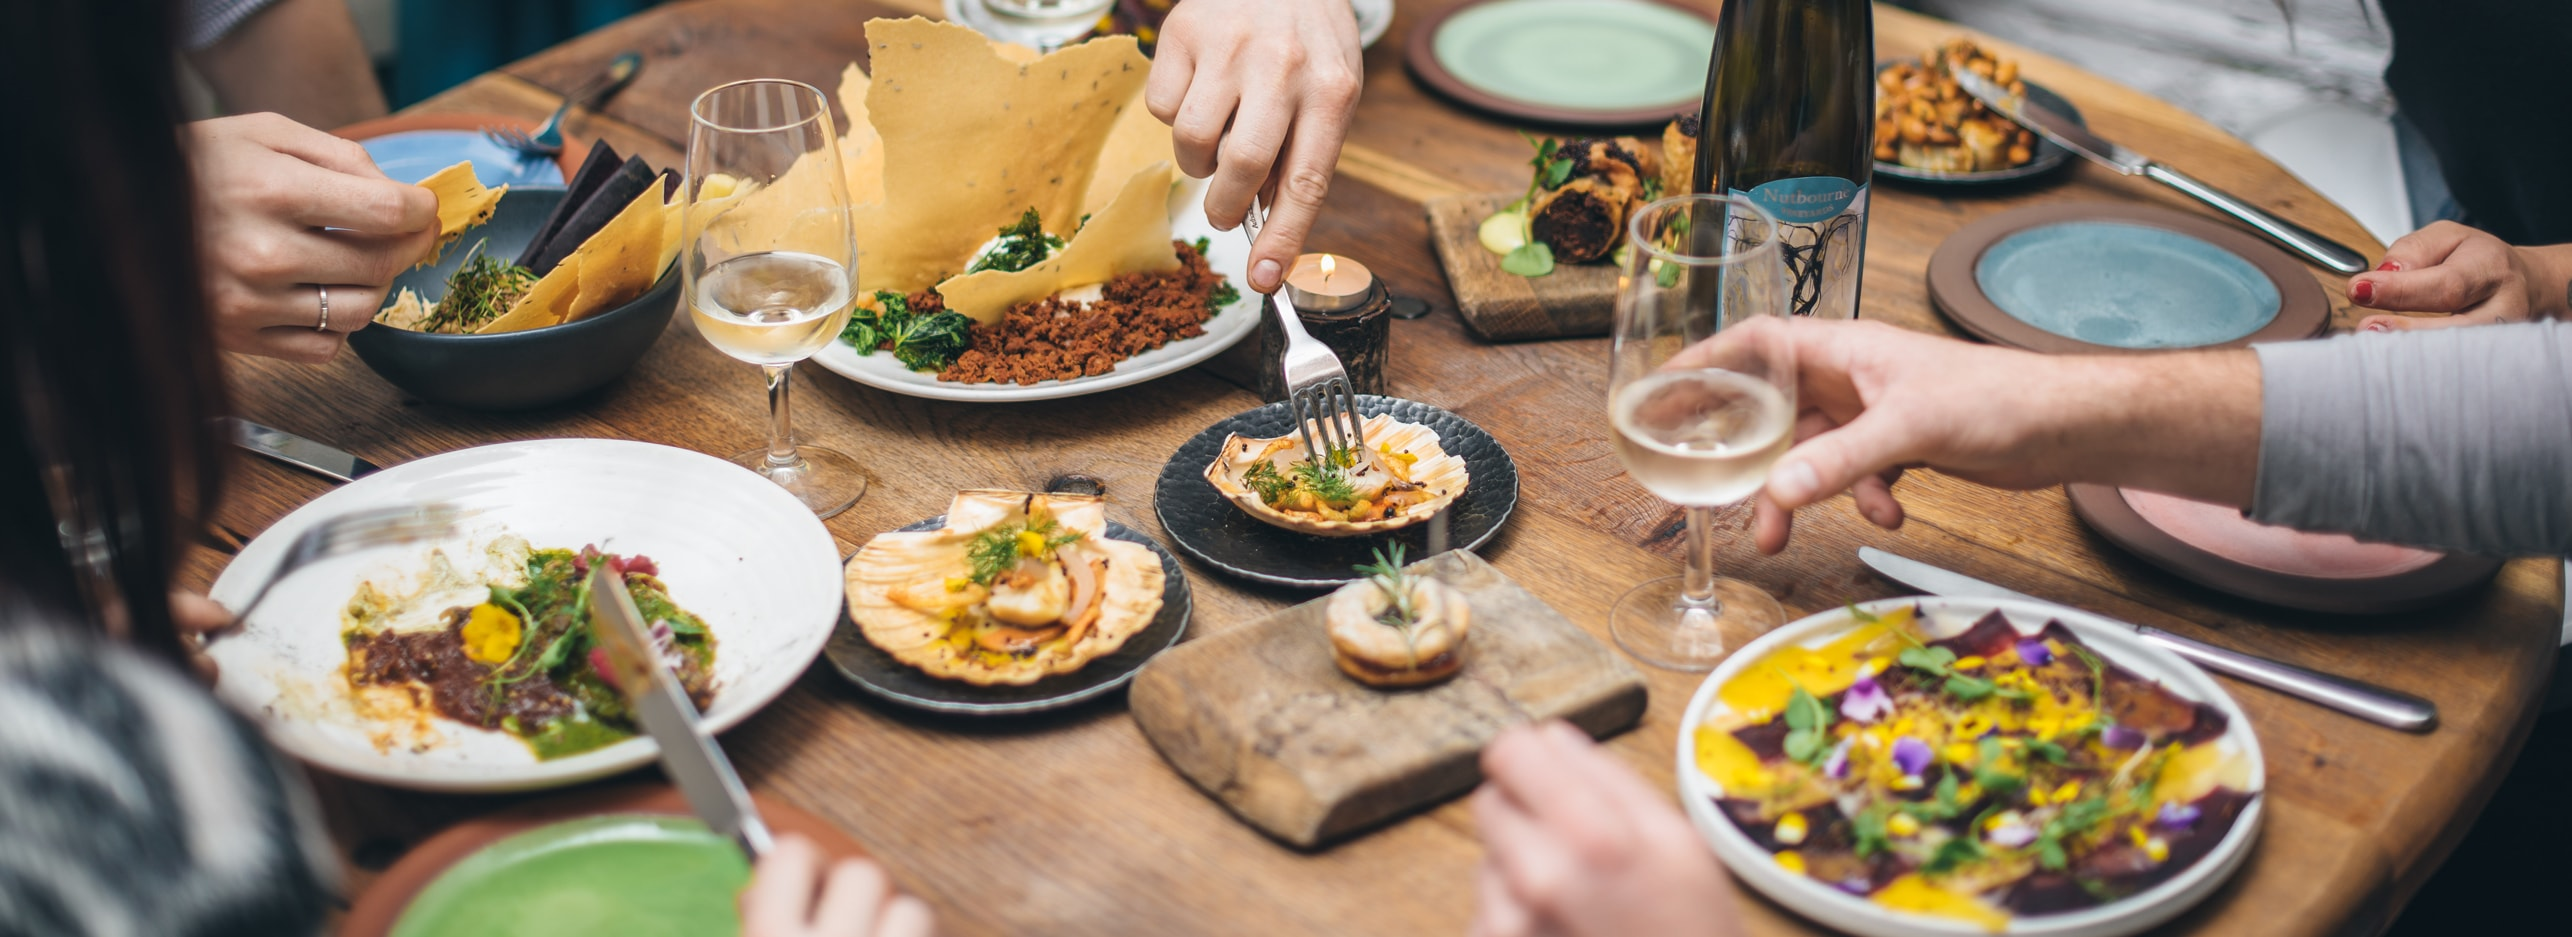 Dinner in the dark london dating online